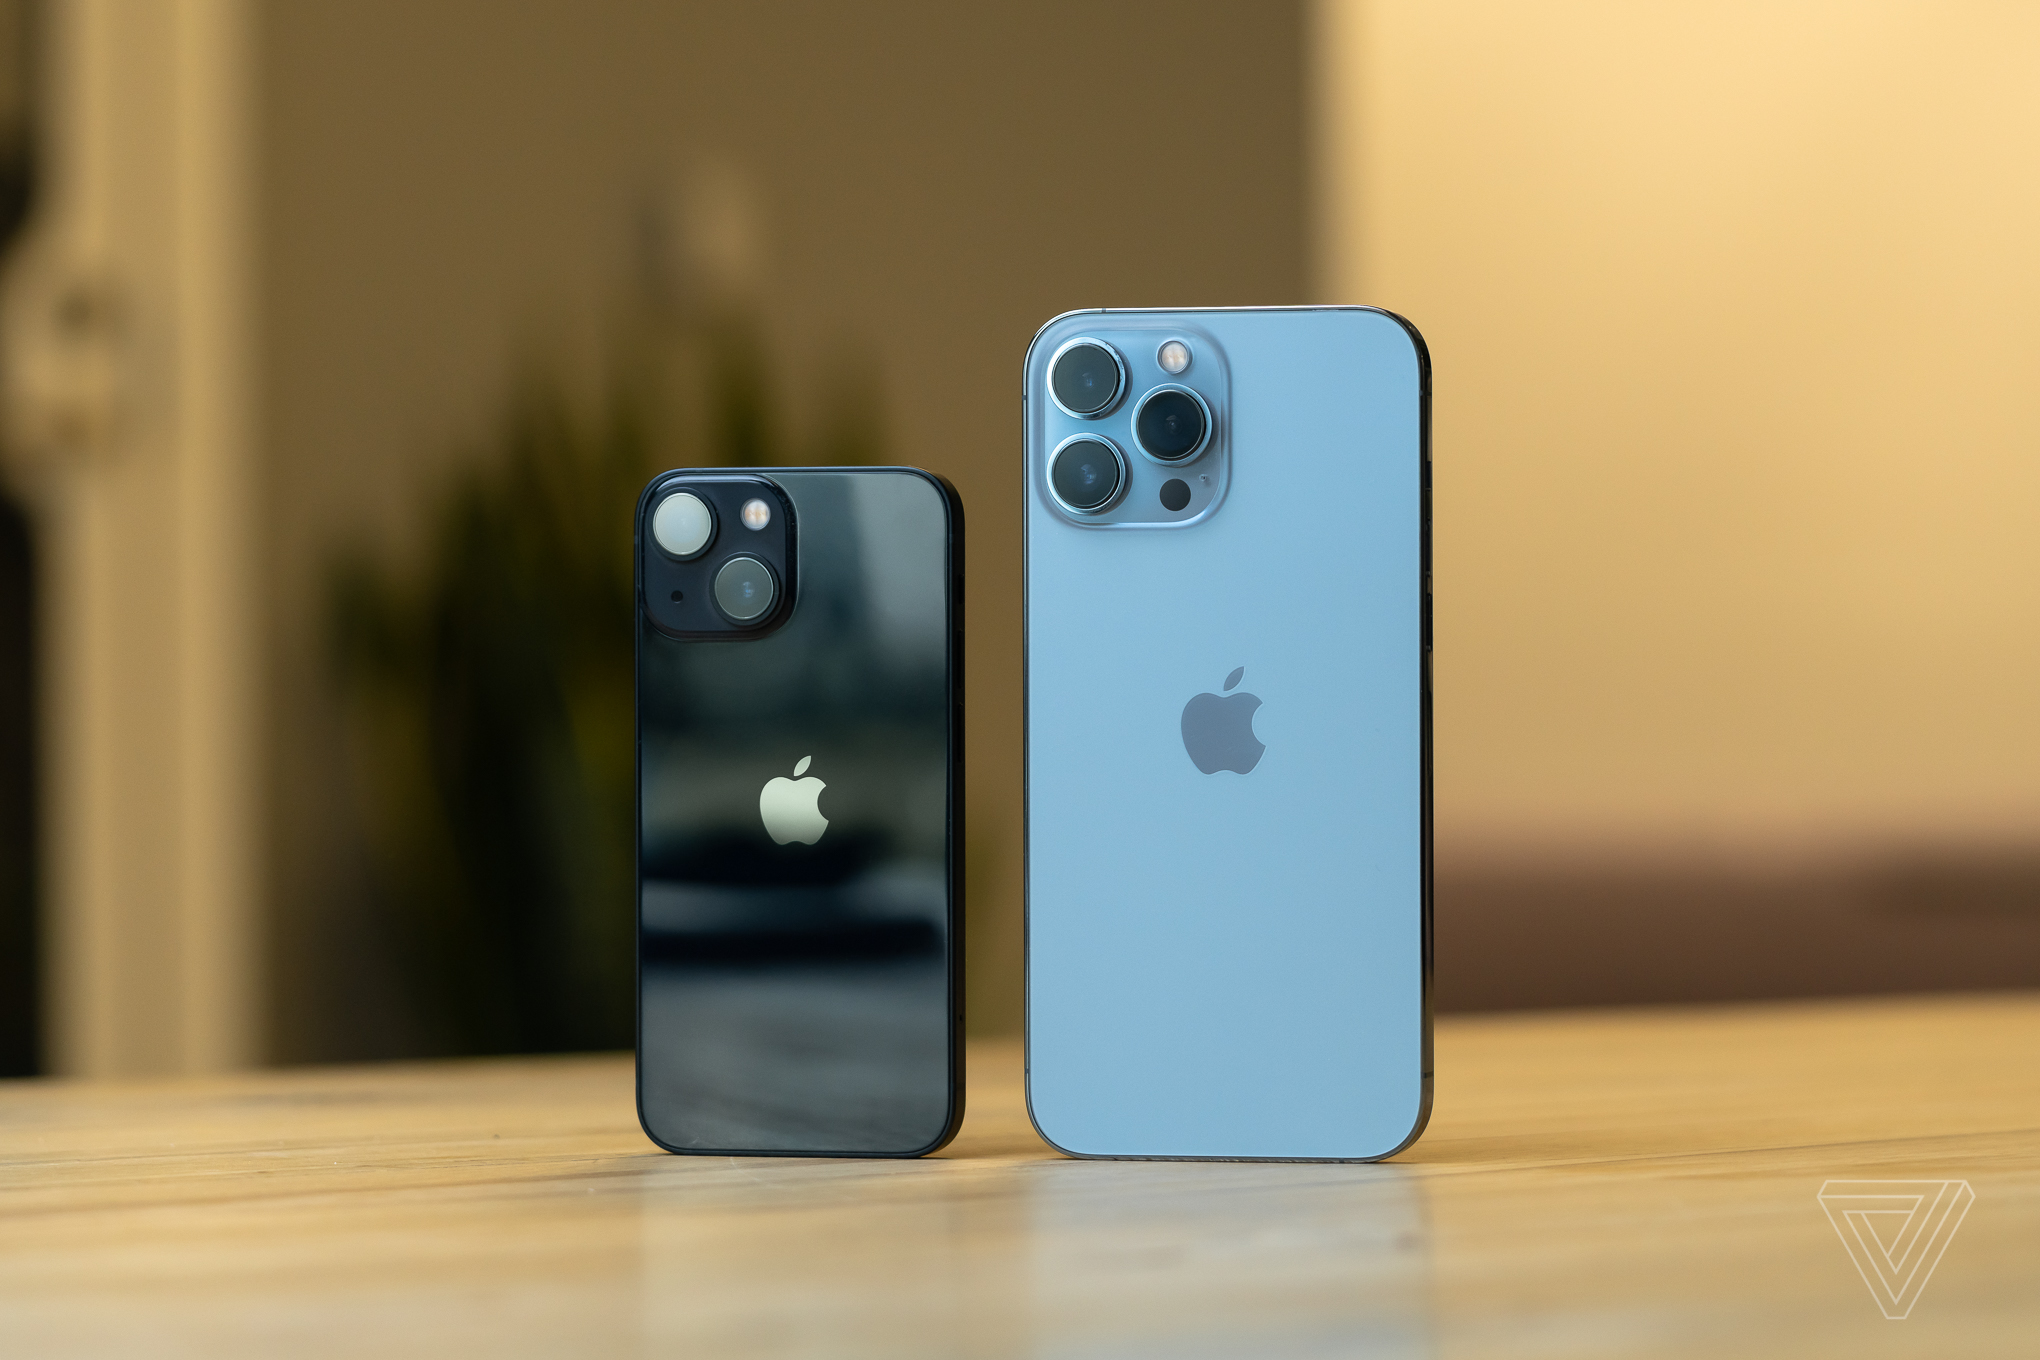 iPhone 13 Mini and iPhone 13 Pro Max